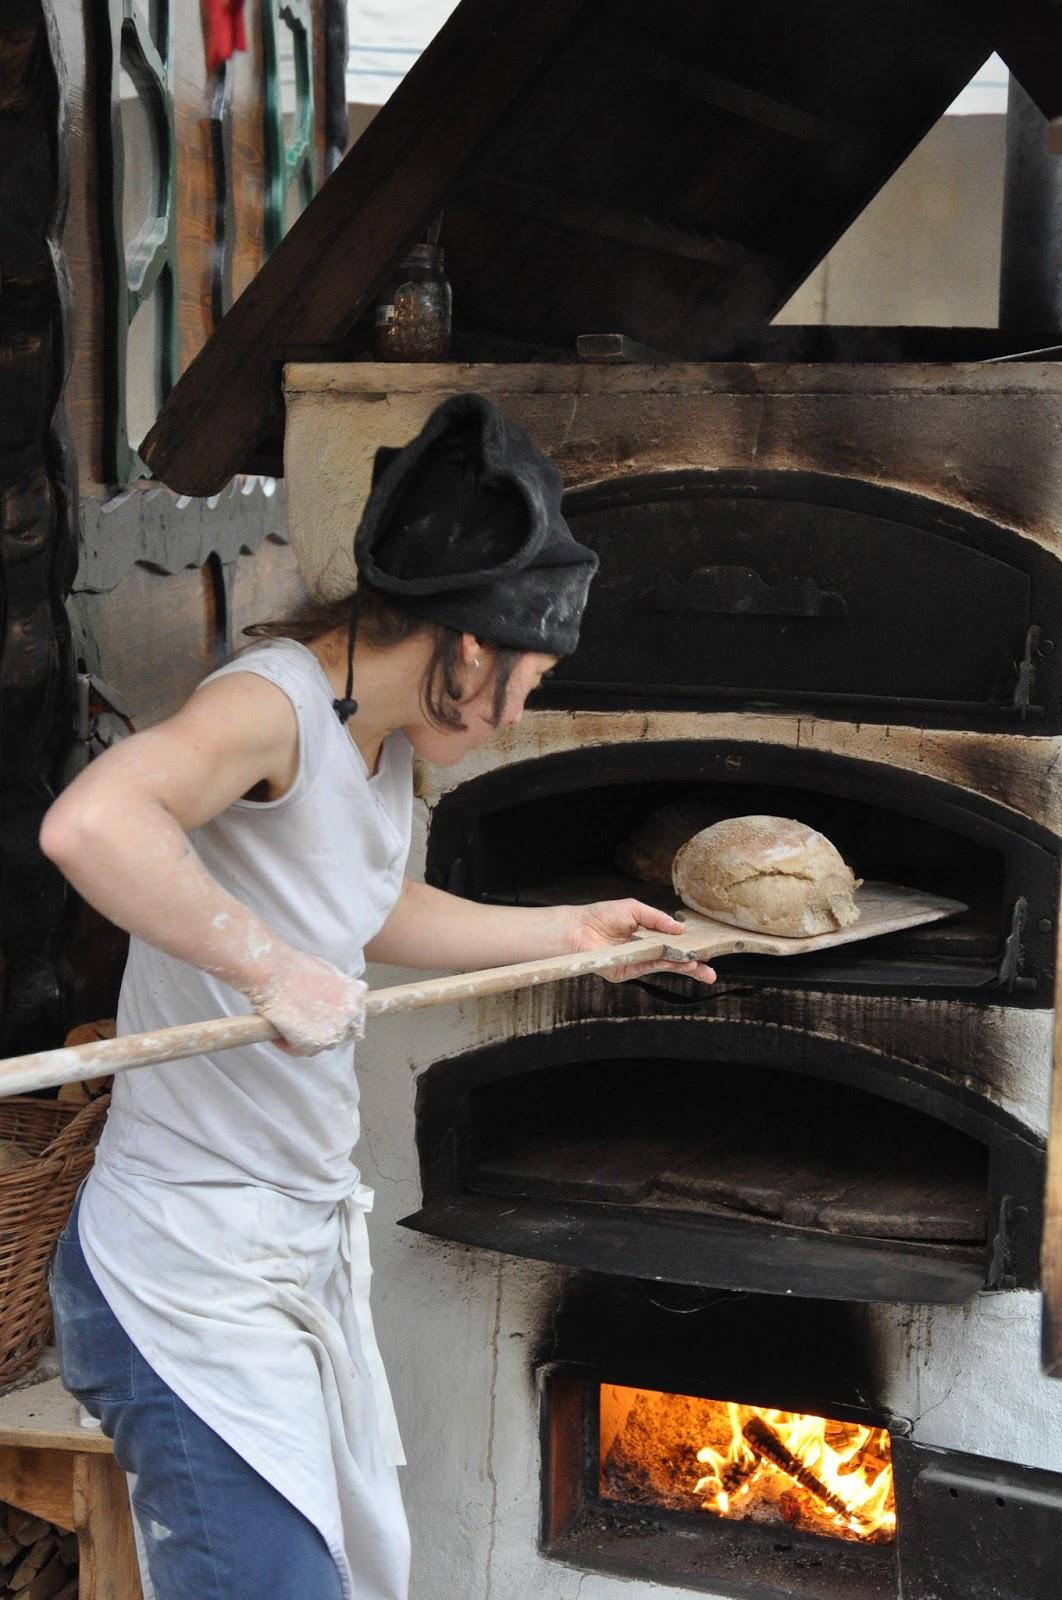 Baking bread, Nuremberg Christmas market, Verona, Italy